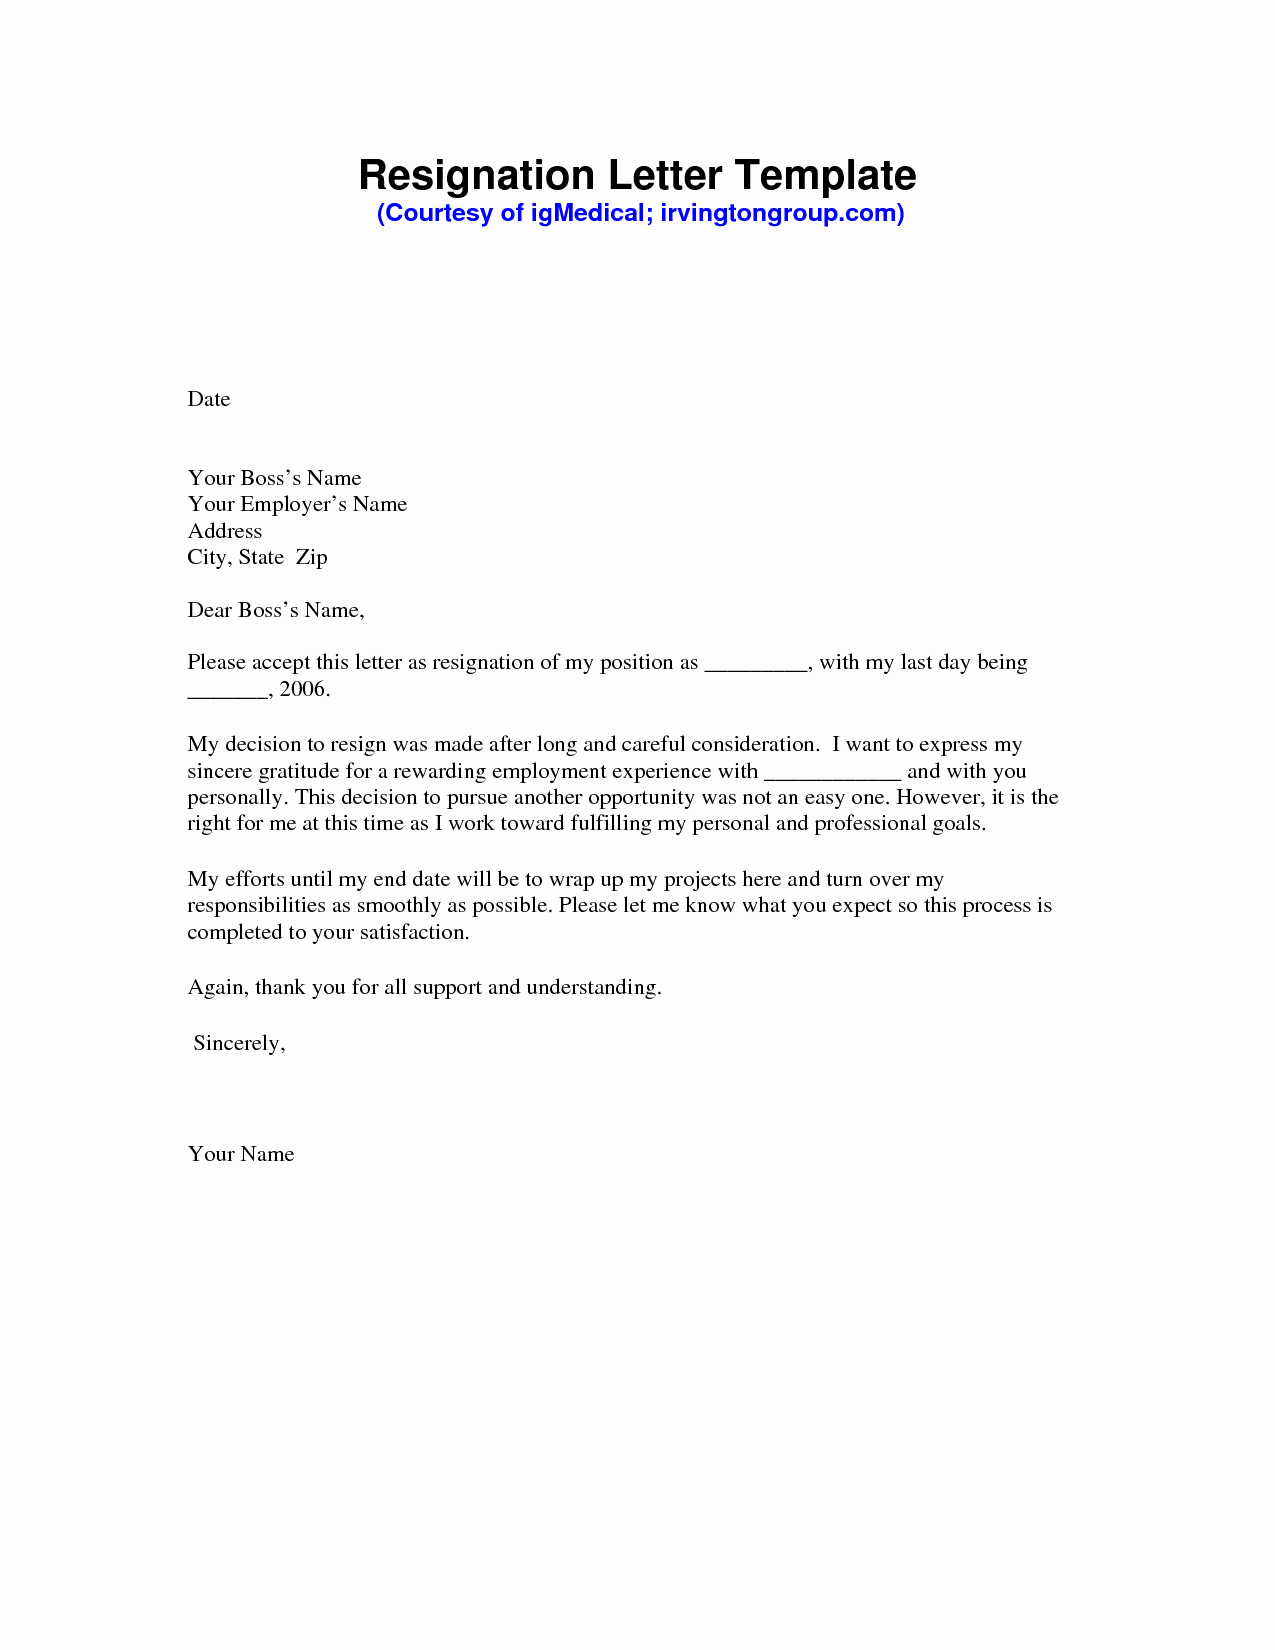 Resignation Letter Template Free Unique Resignation Letter Sample Pdf